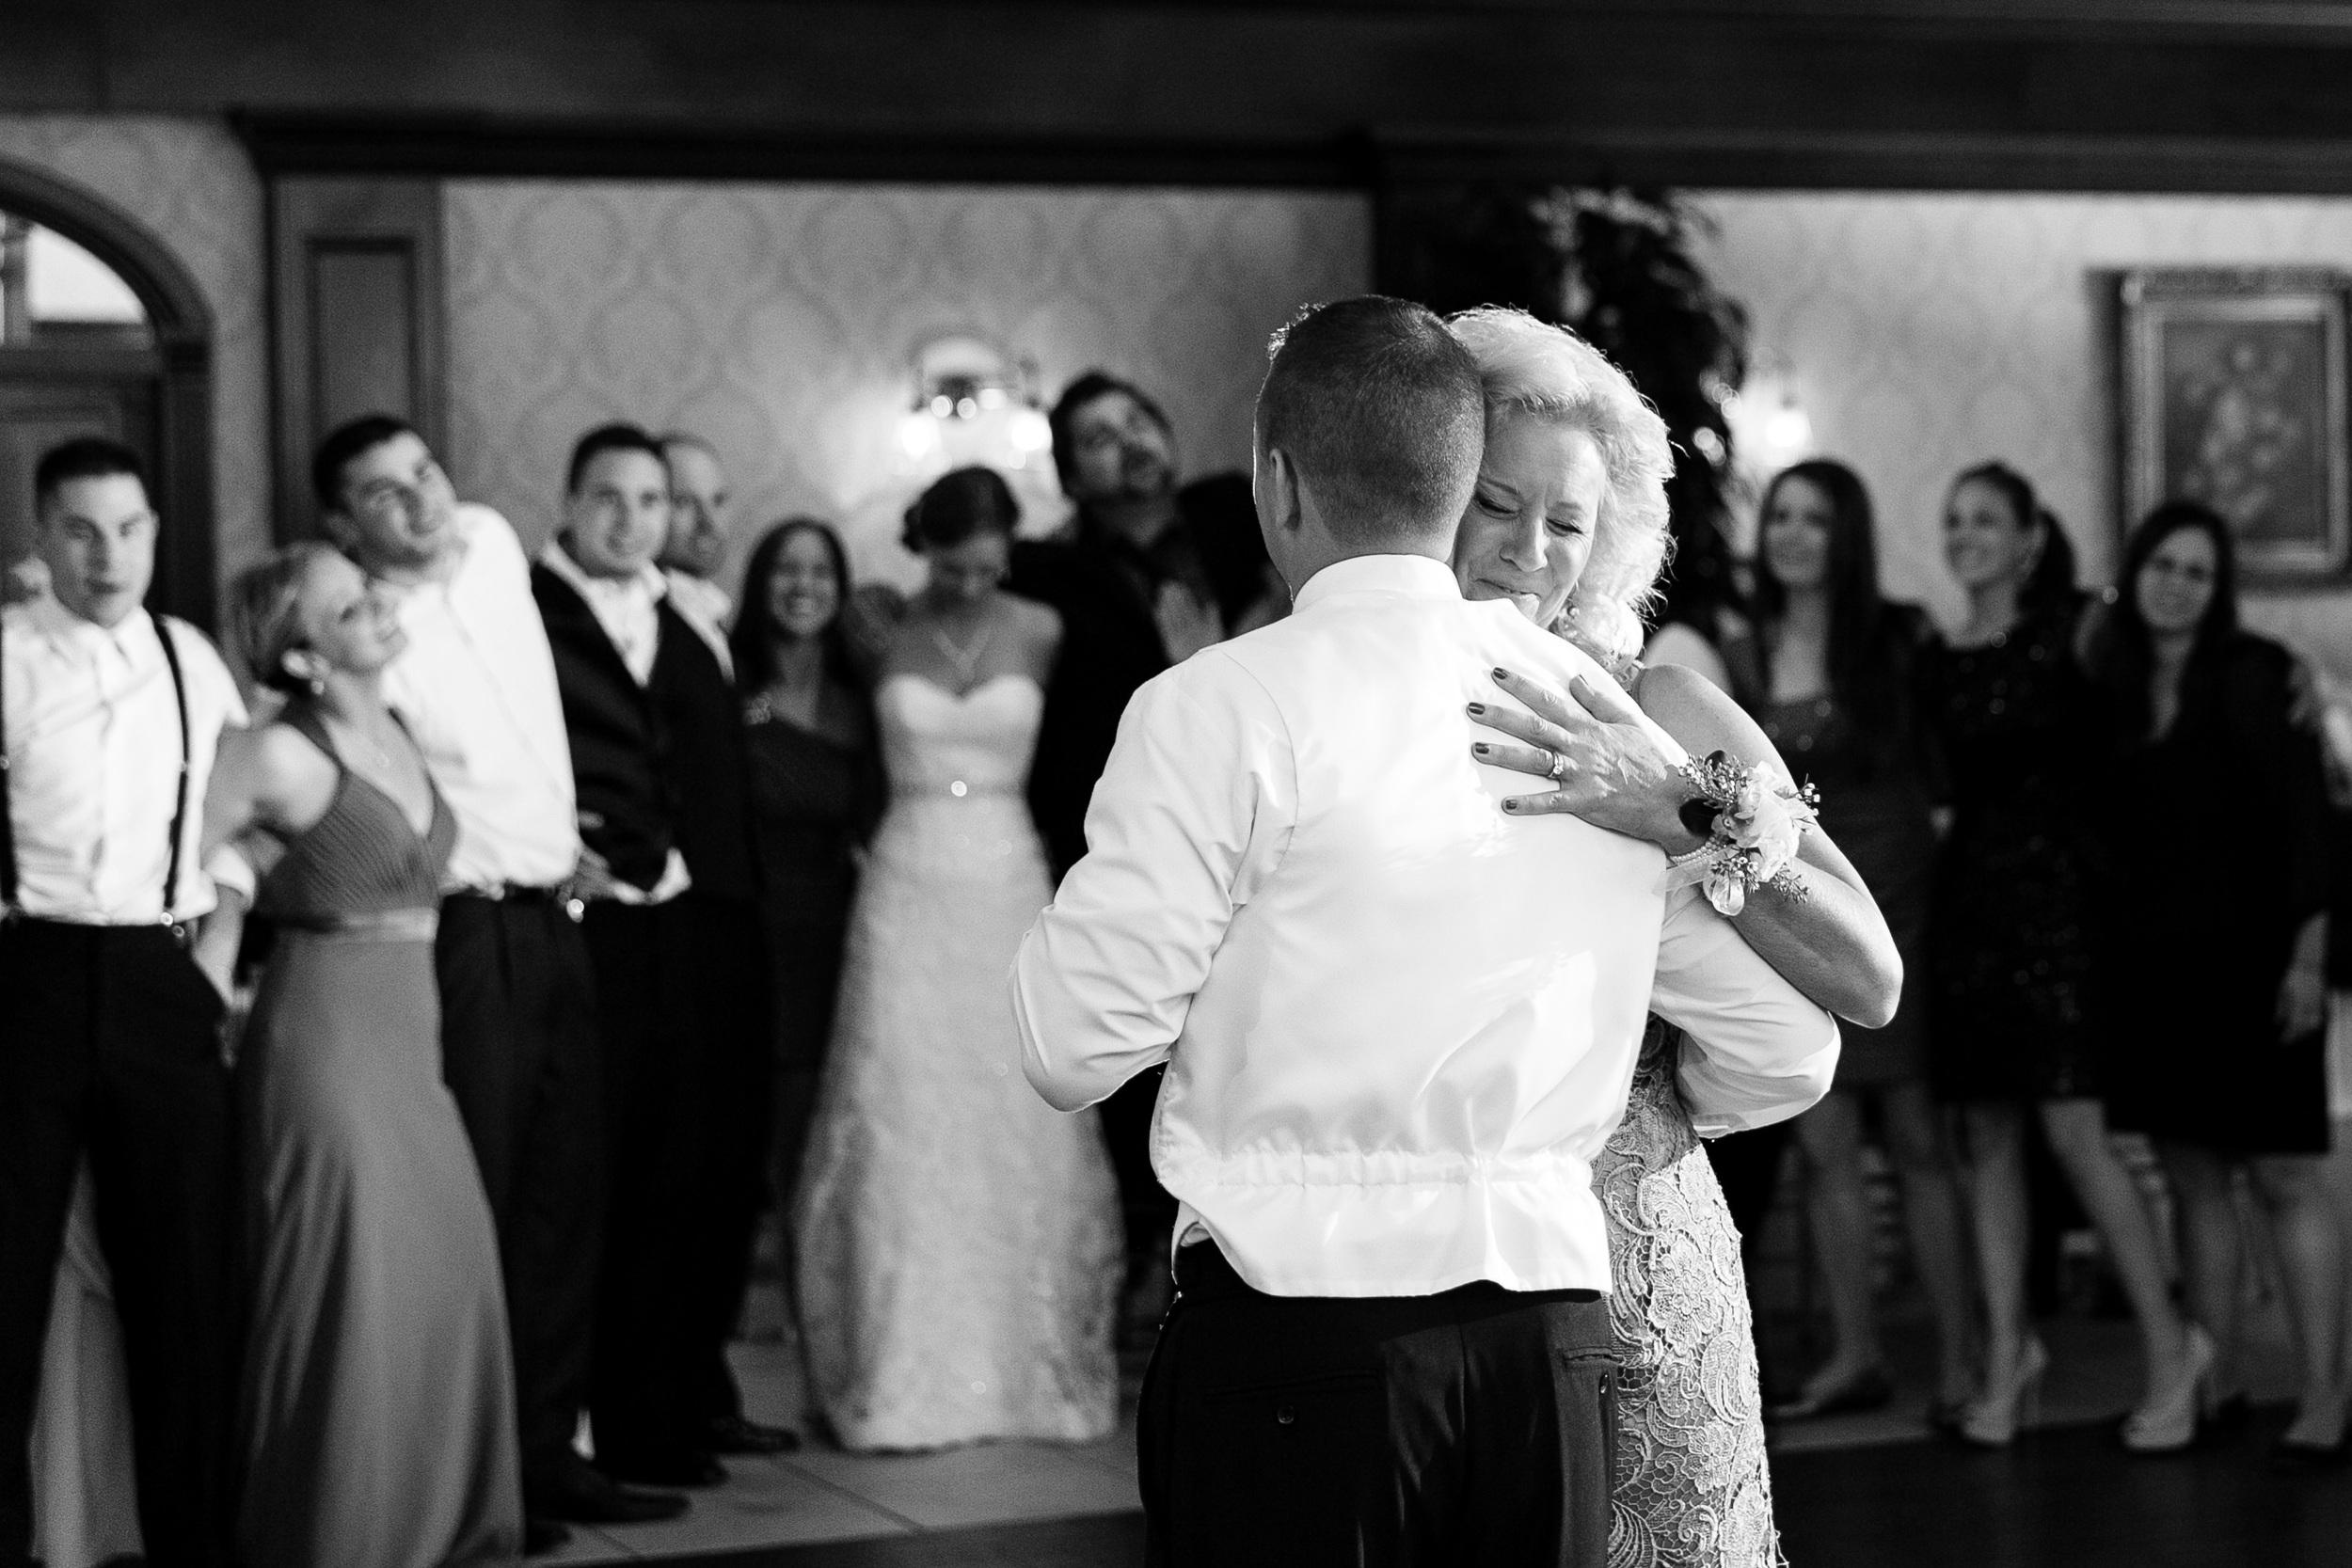 Romantic-Wedding-Aqua-Turf-Connecticut-Photojournalistic-Photography-by-Jacek-Dolata-12.jpg